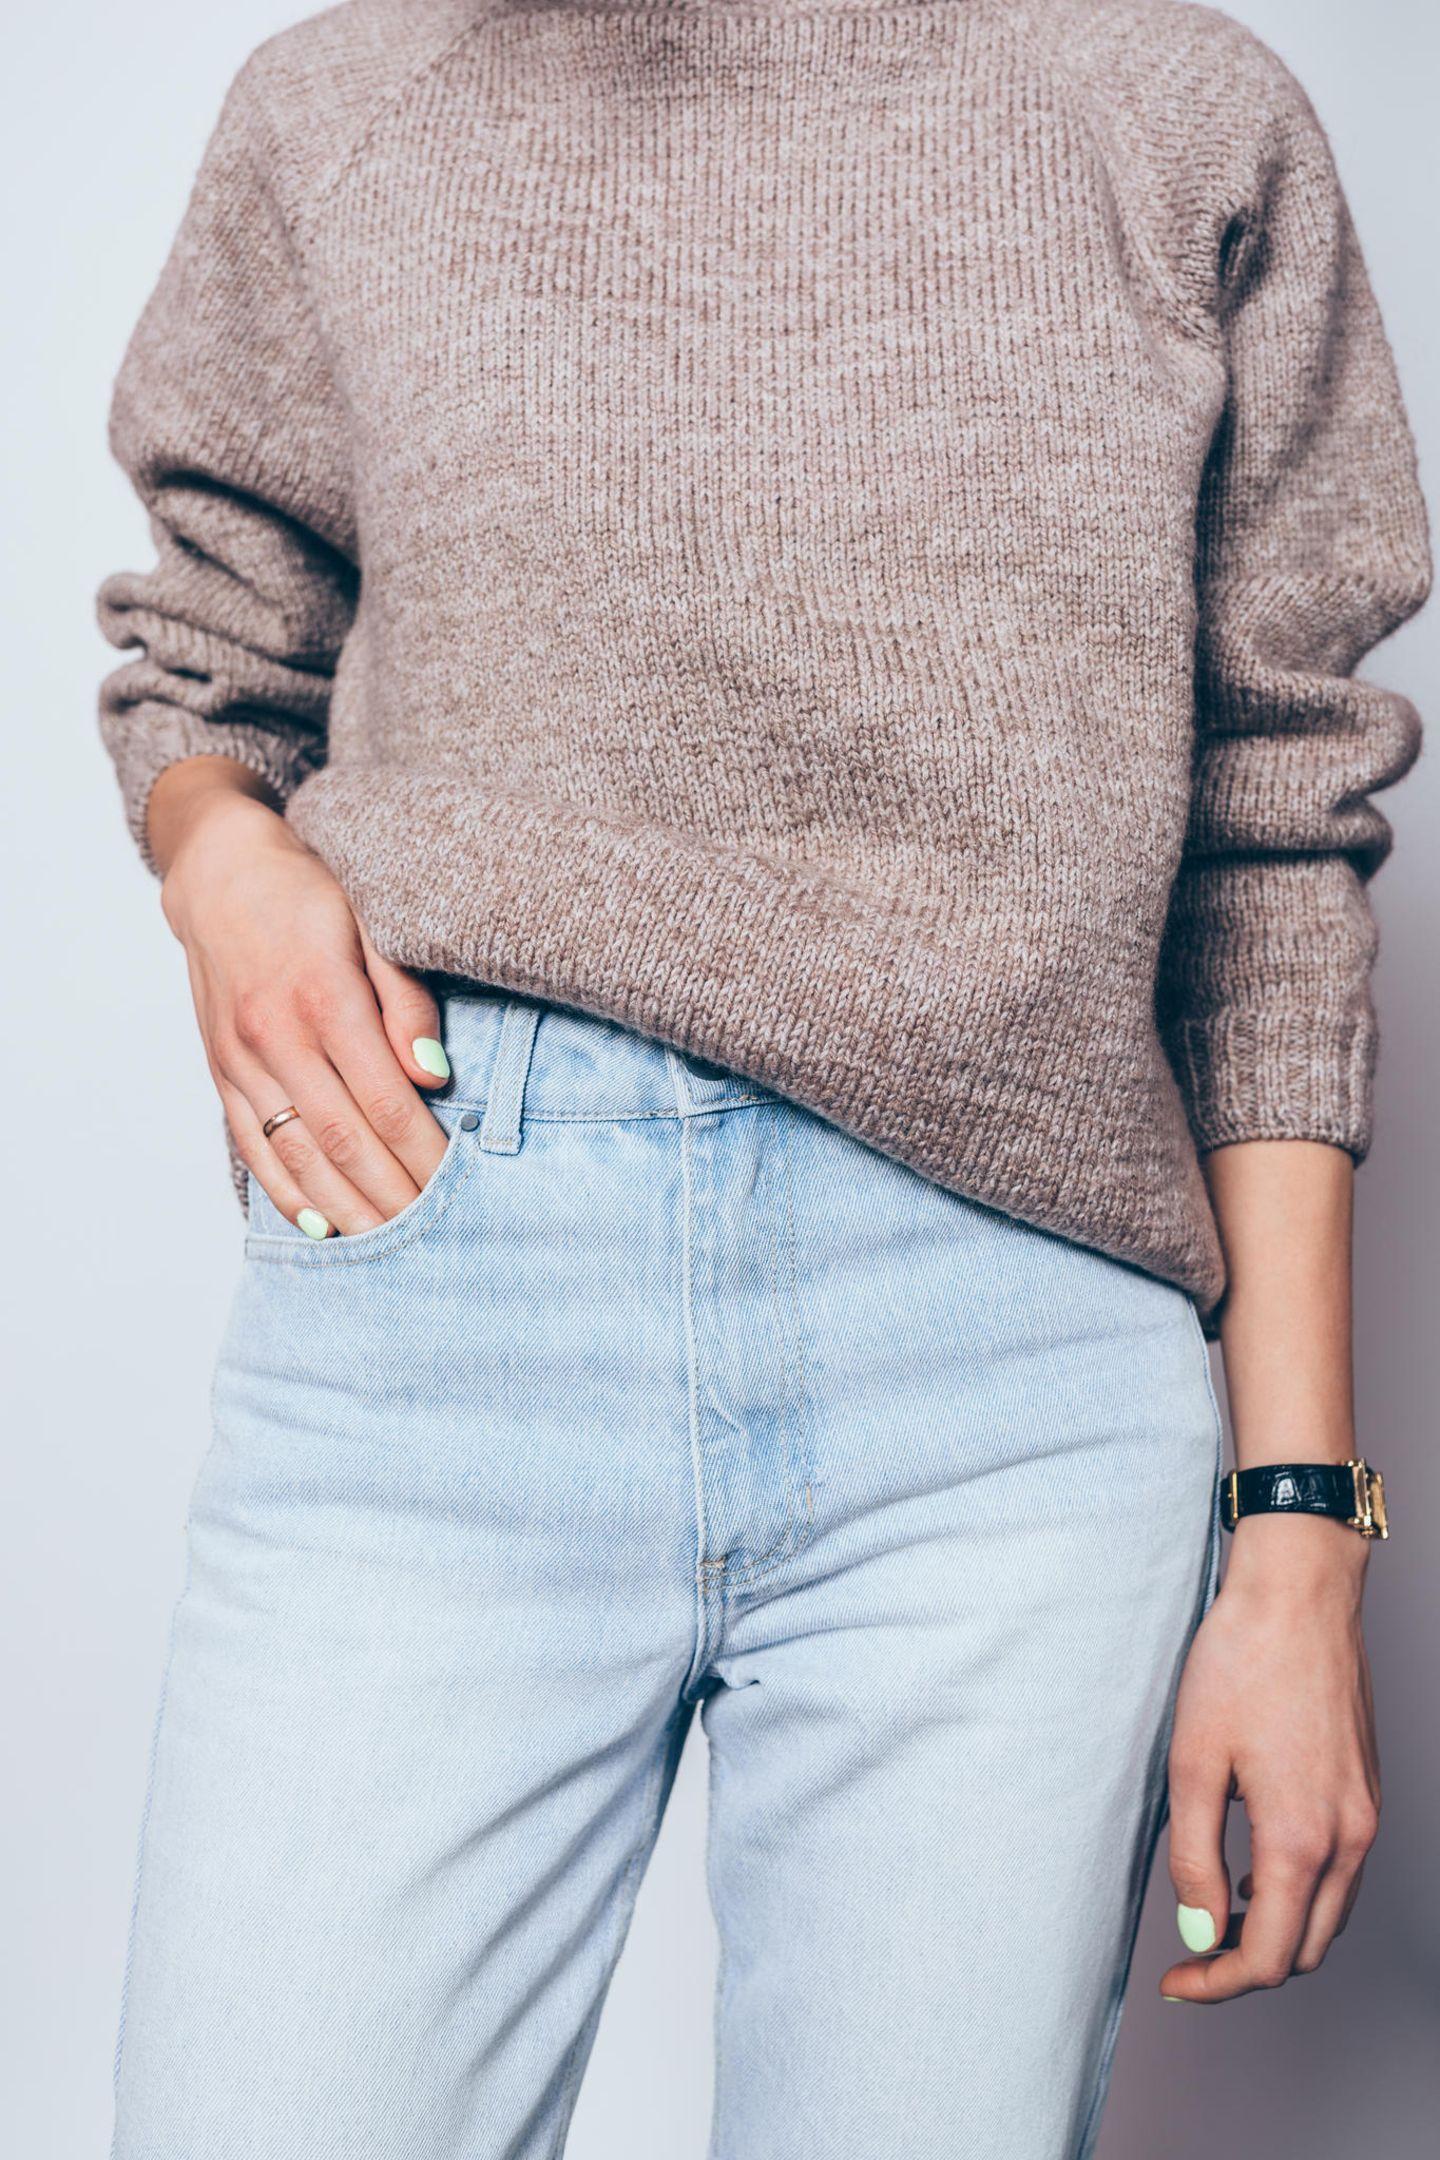 Figurberatung Jeans: Frau kleiner Bauch